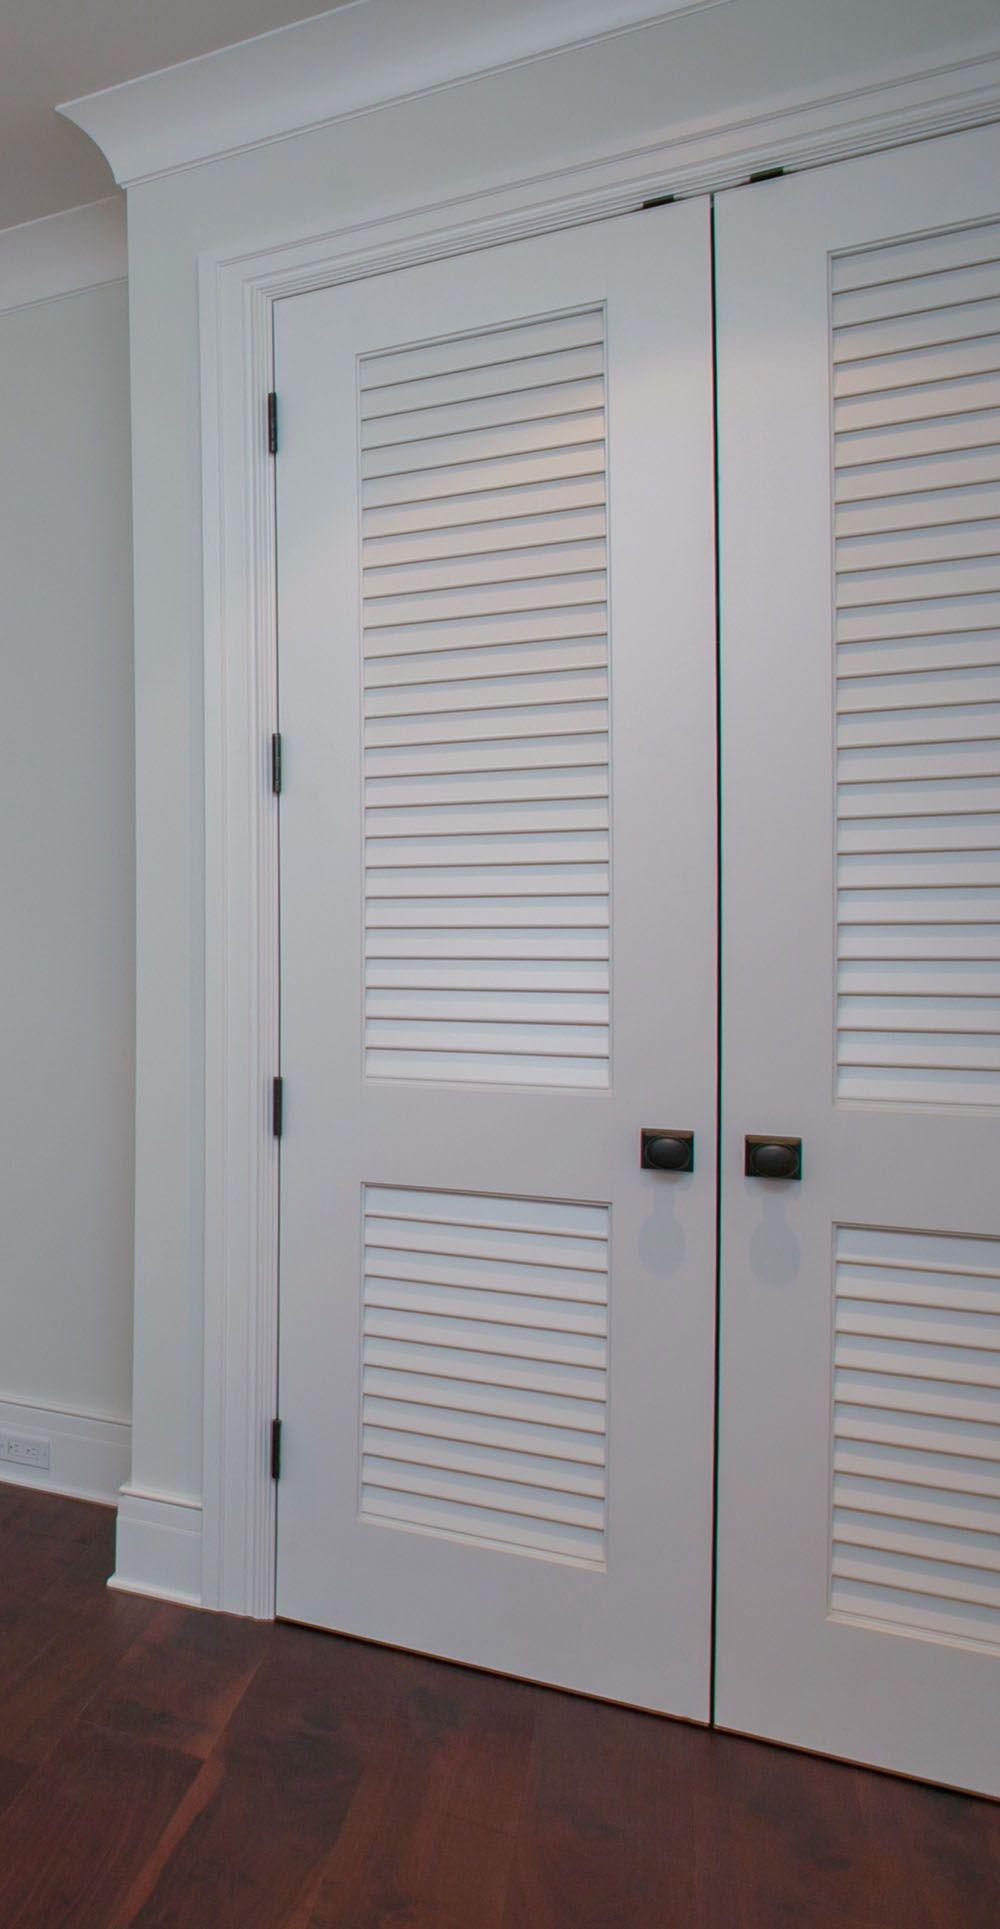 Supa Doors Stile Amp Rail Interior Mdf Paneled Fire Rated Louvered Amp Glass Doors Laundry Room Closet Room Doors Interior Barn Doors